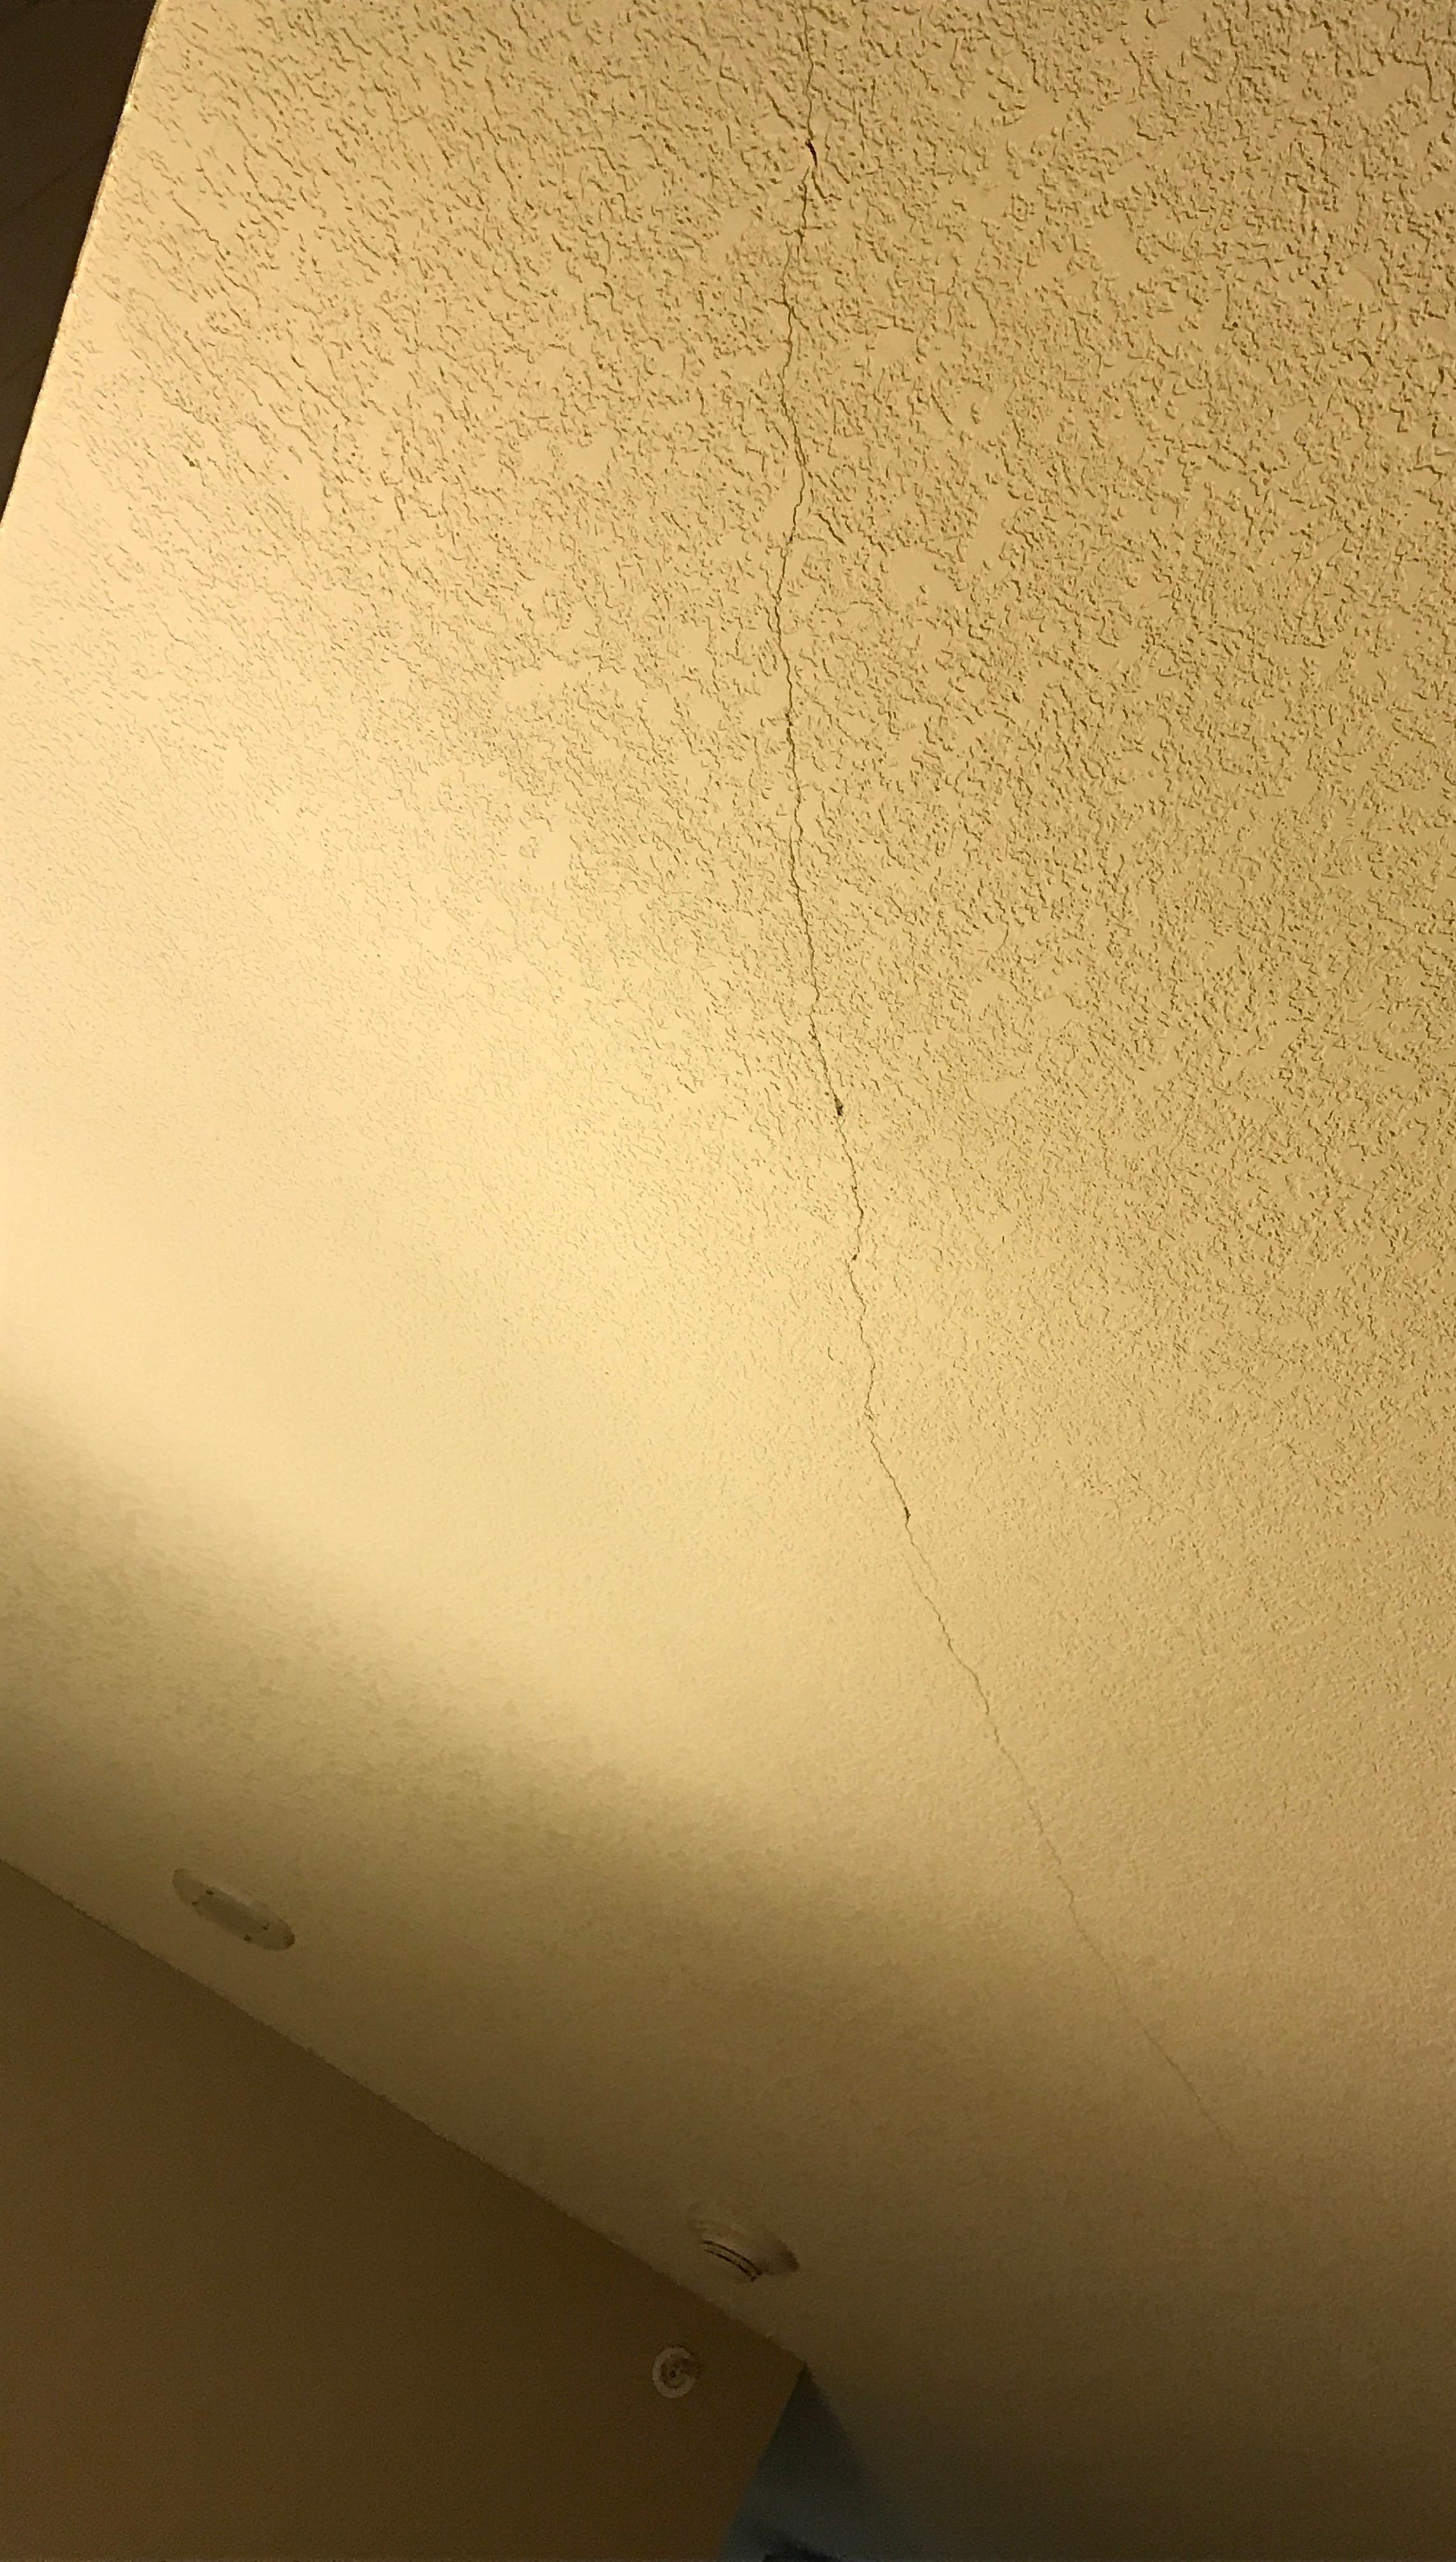 Large crack on ceiling